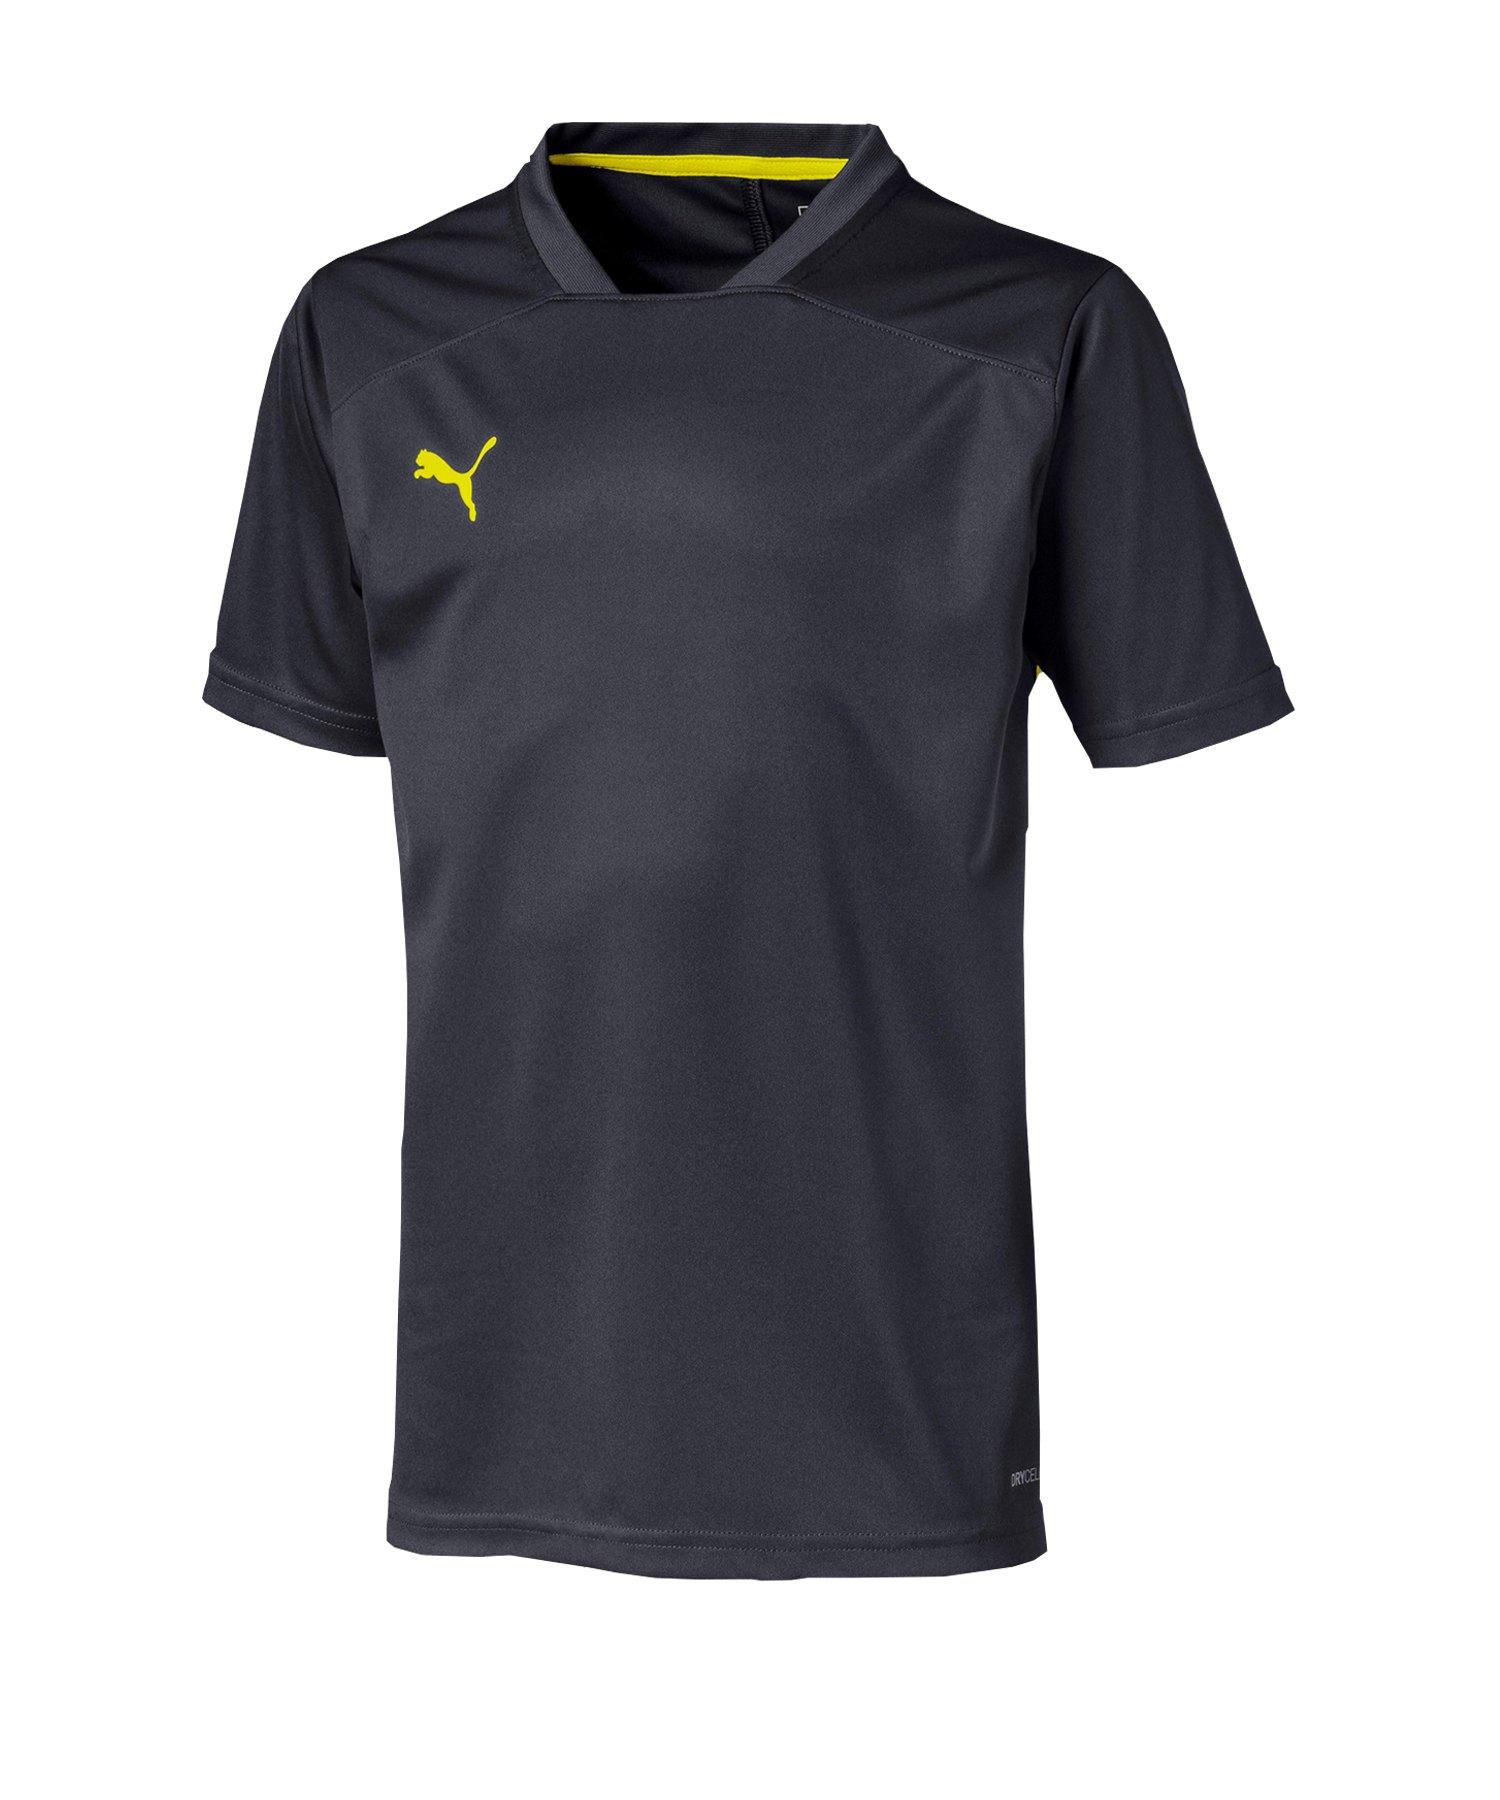 PUMA ftblNXT T-Shirt Kids Schwarz Gelb F02 - schwarz